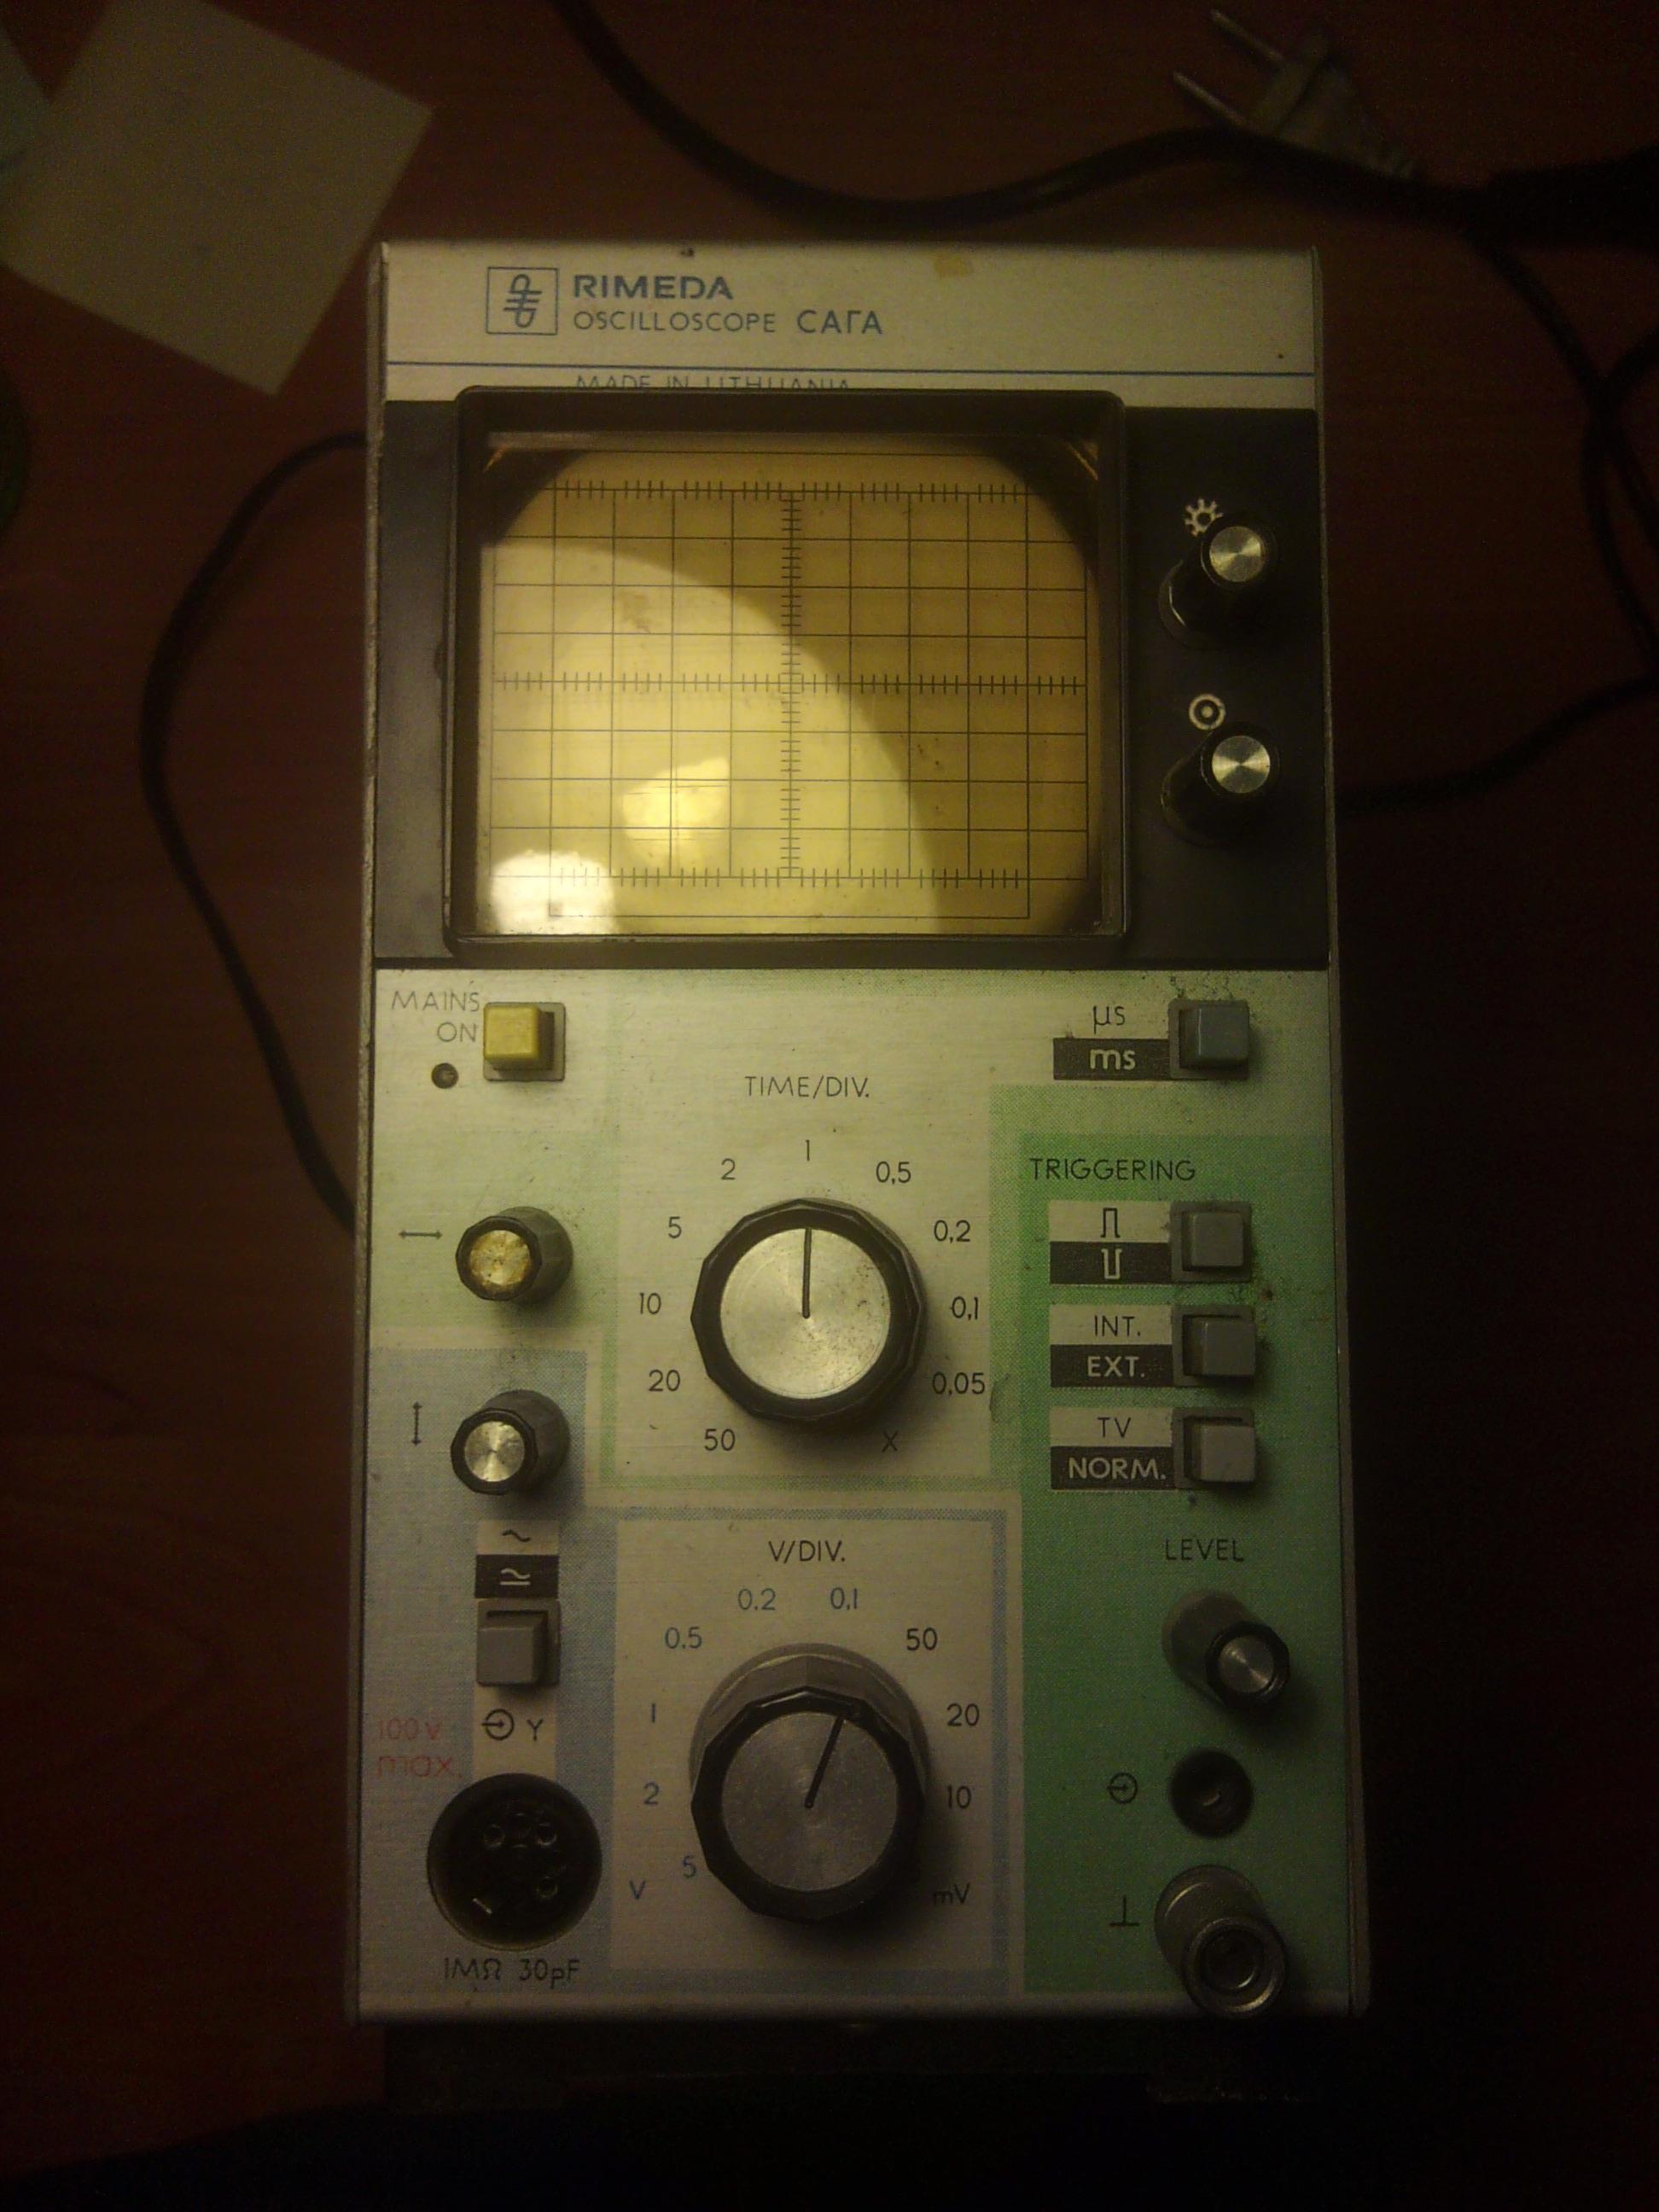 Oscyloskop RIMEDA CAΓA - Jak zrobi� sond�, schemat